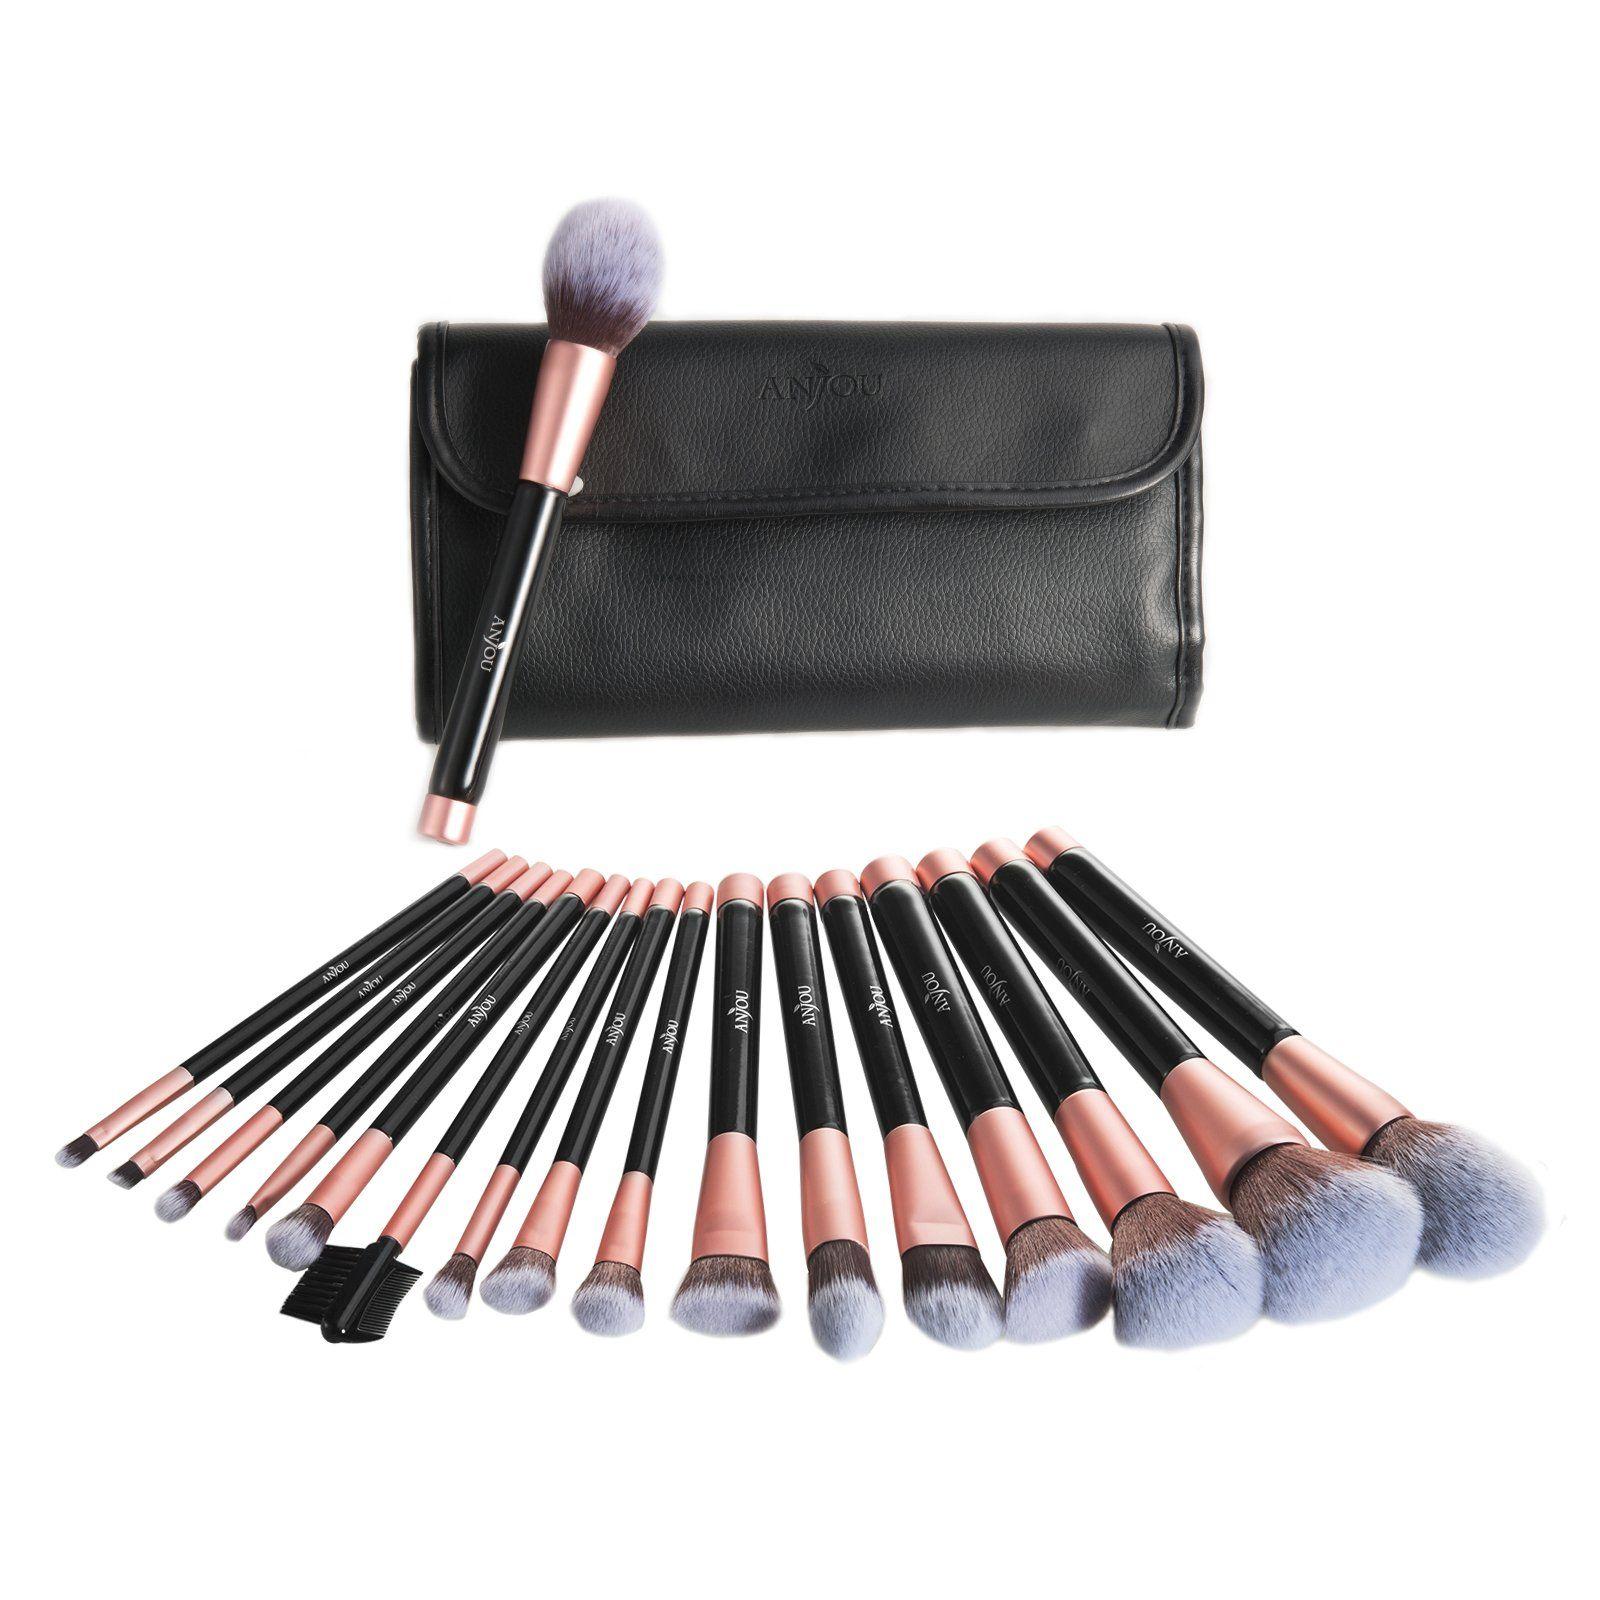 c771af5fc5ea Anjou Makeup Brush Set 16pcs Premium Cosmetic Brushes for Foundation ...